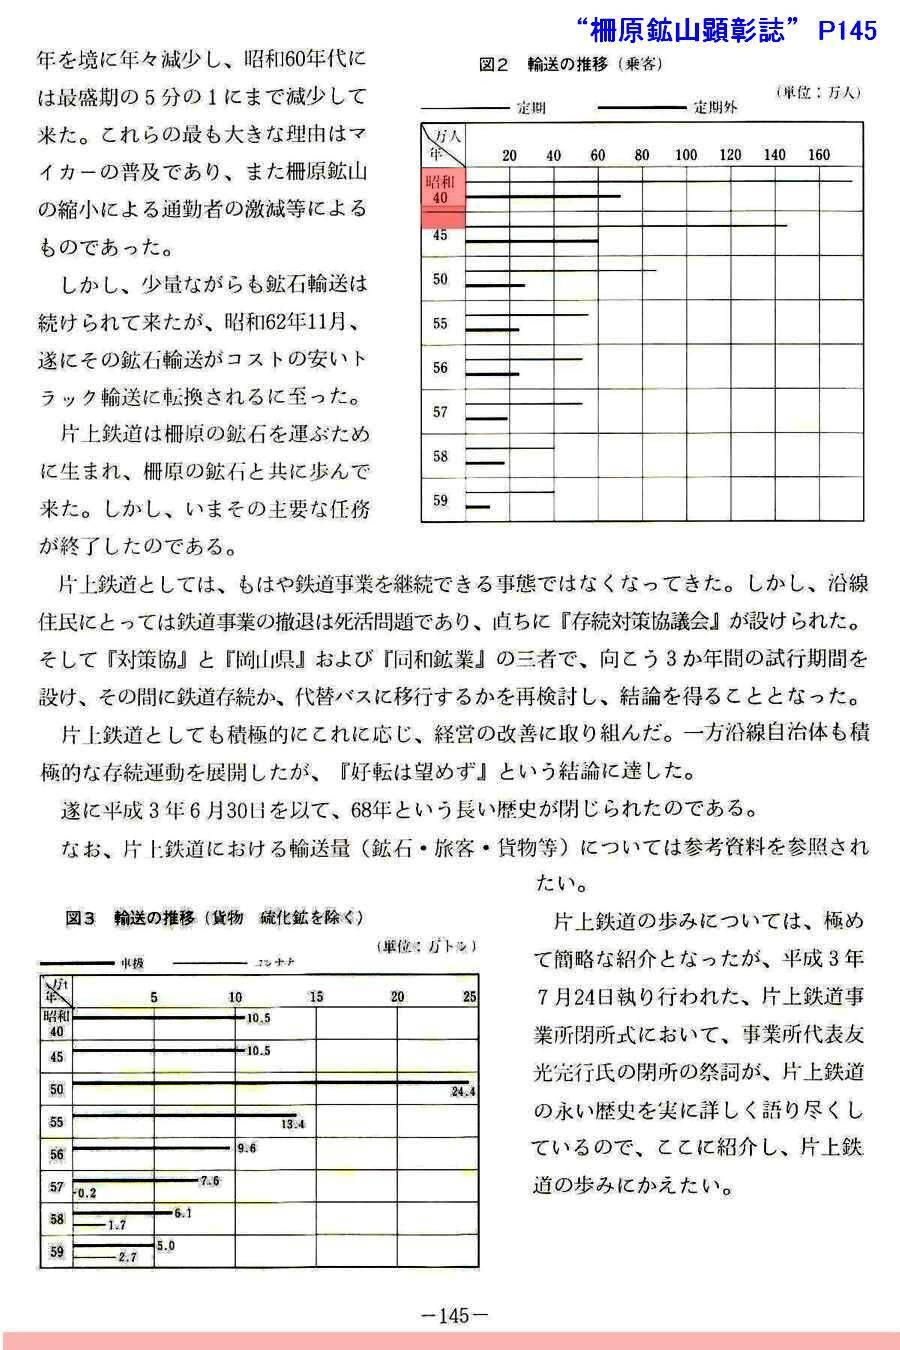 FC0122-005.jpg